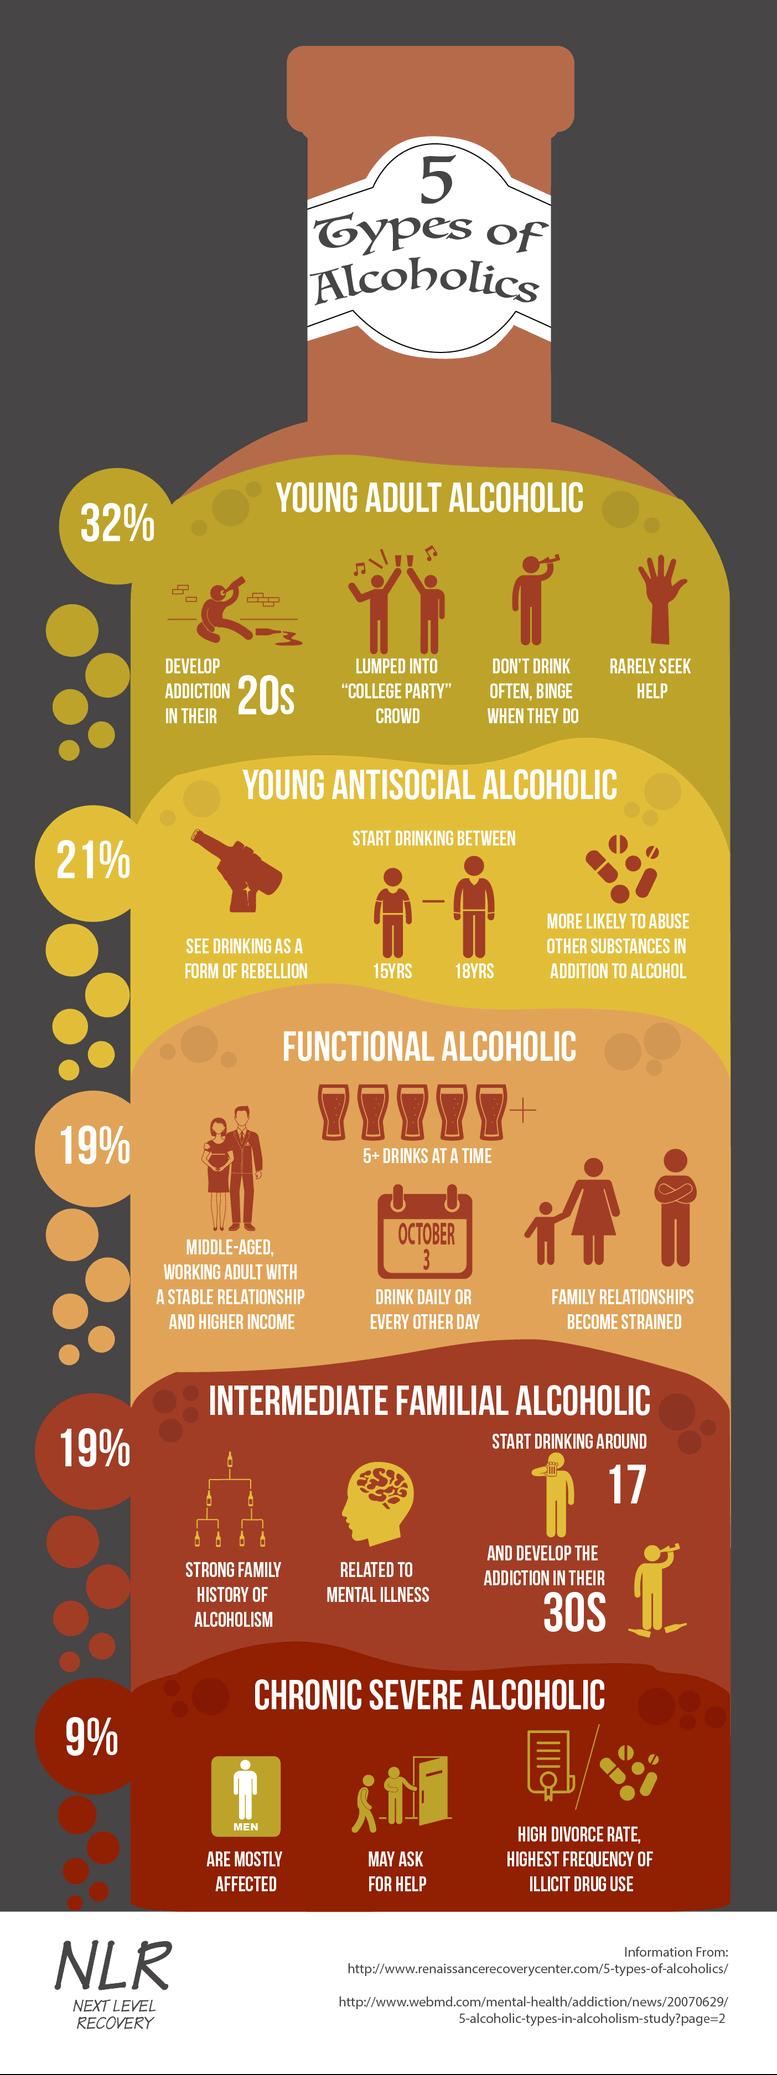 next-level-recovery_infographic_fivetypesofalcoholics